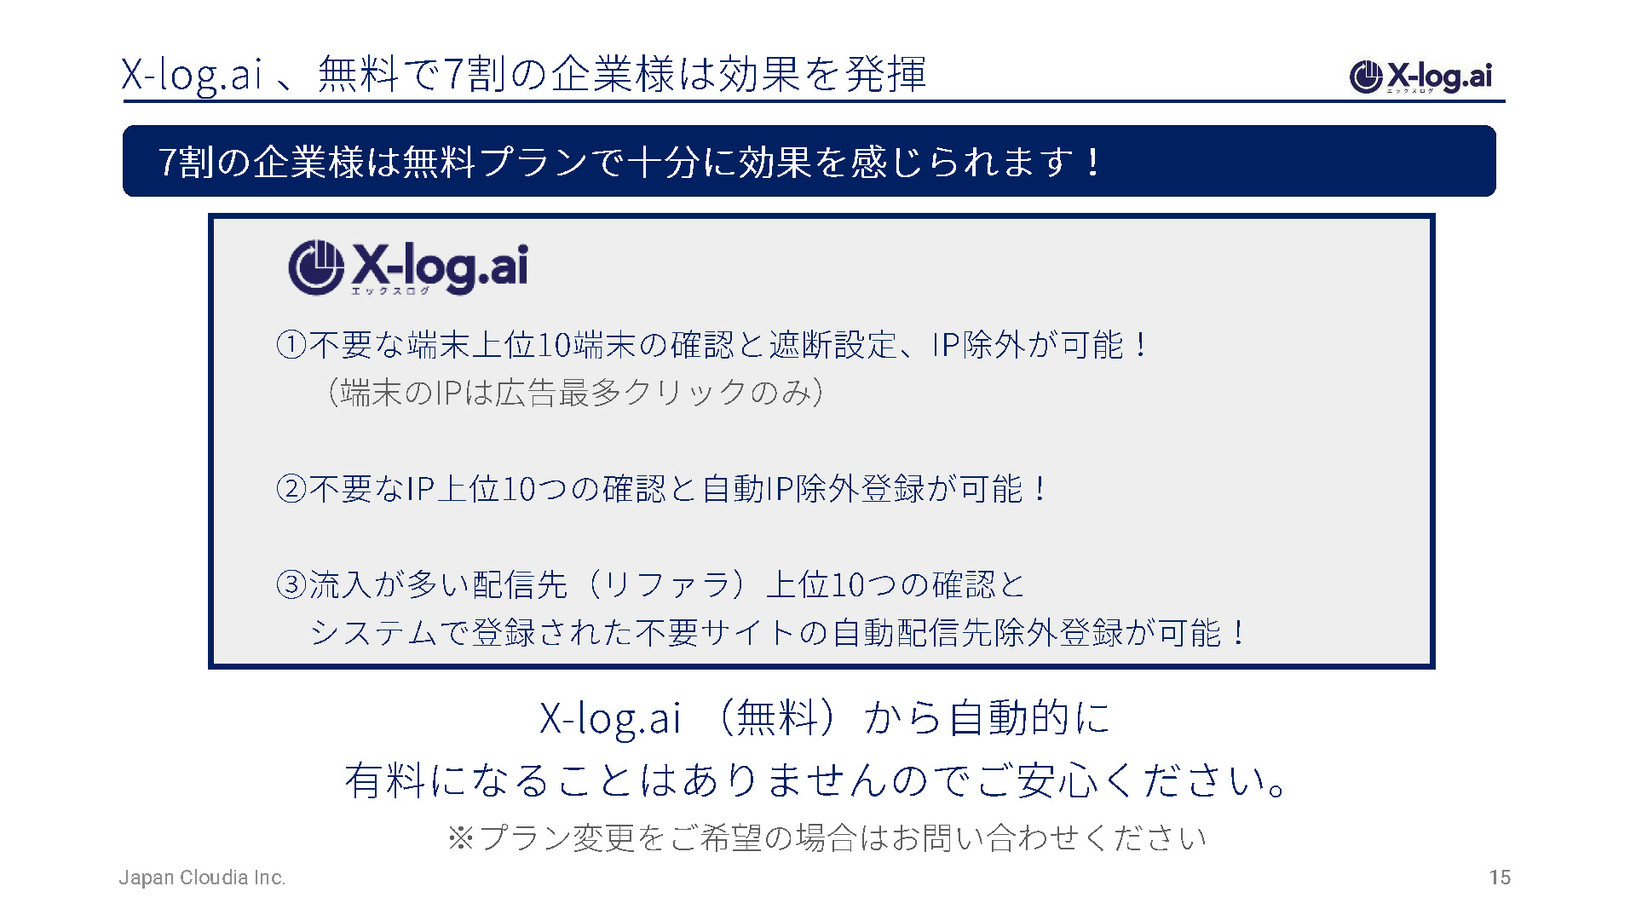 X-log.aiご案内資料_ページ_15.jpg